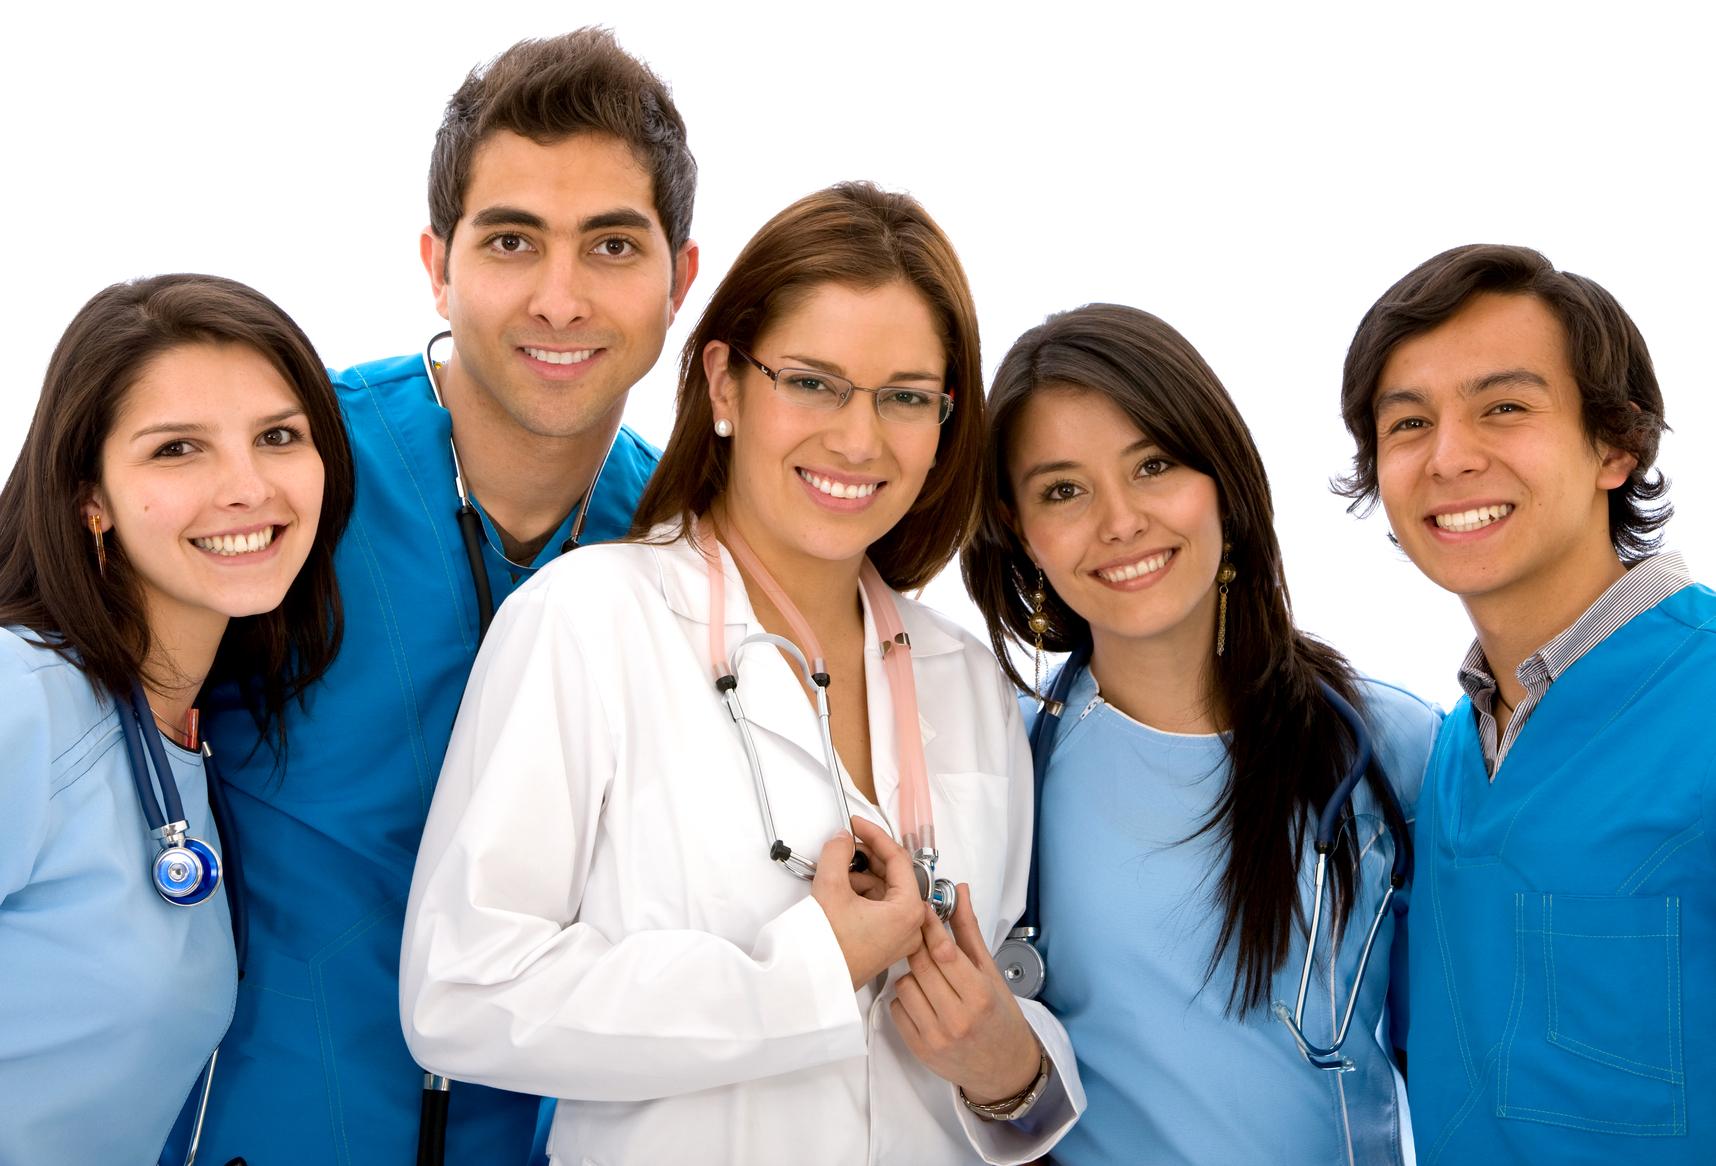 student doctor program back - HD1716×1166